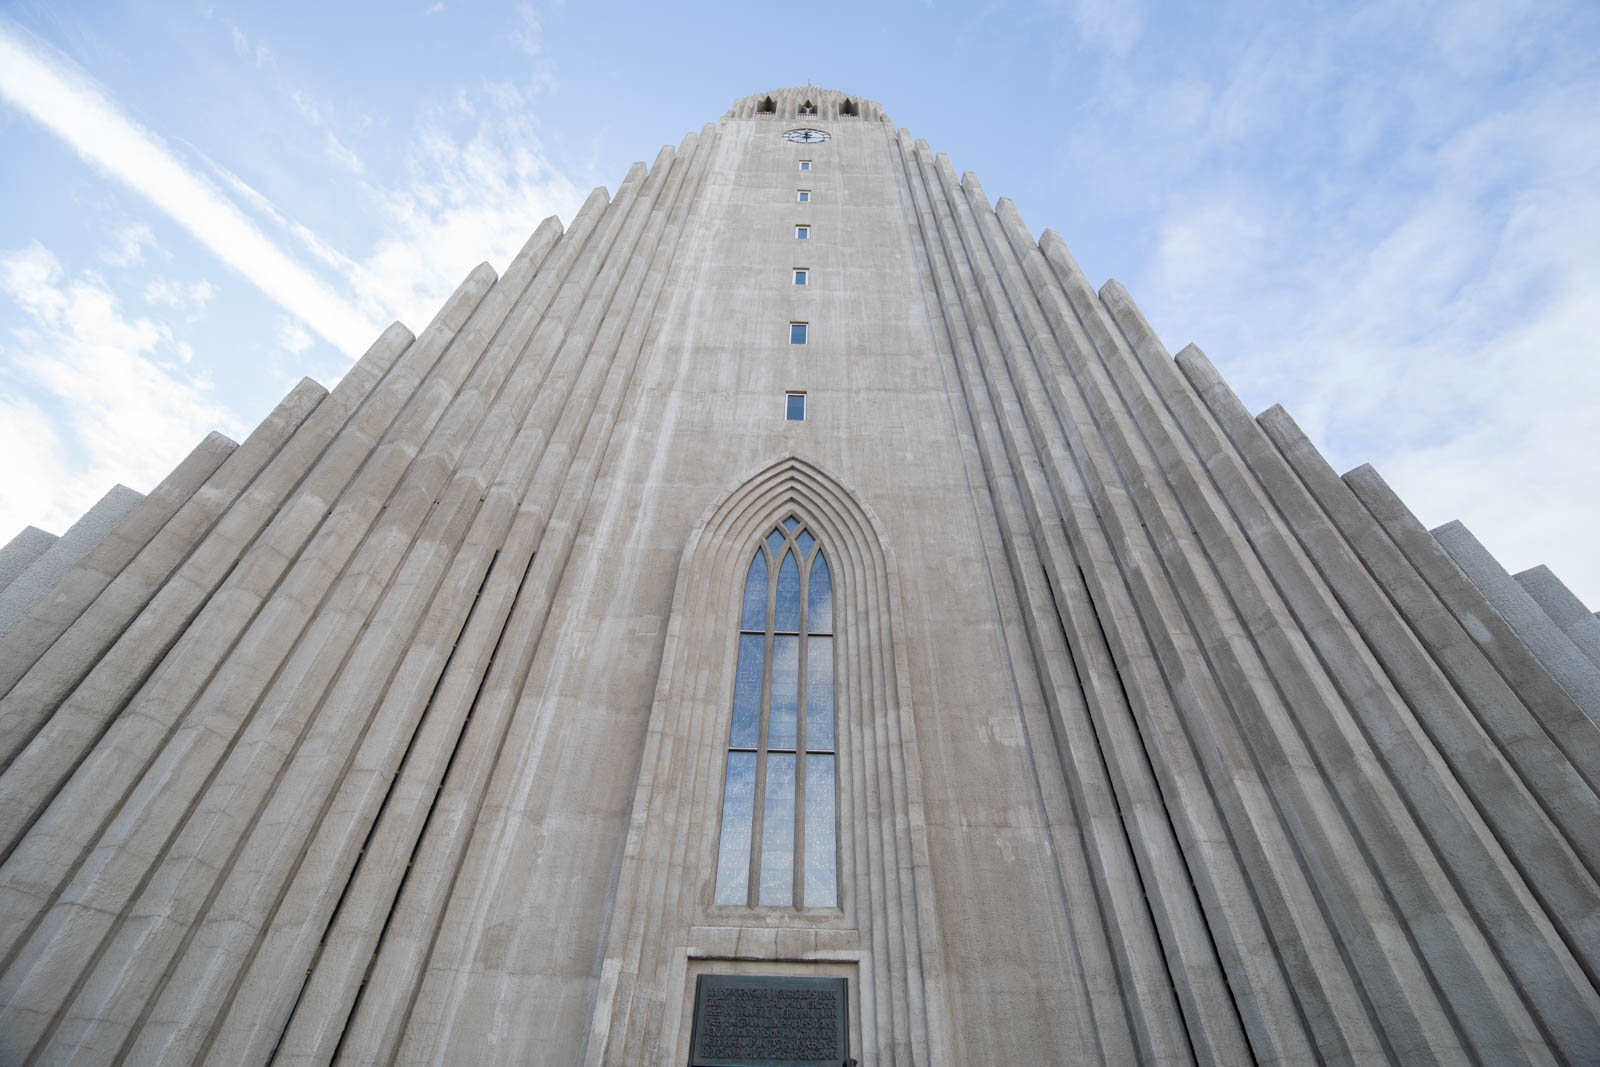 Photo: Sehenswert in Reykijavik: Hallgrimskirkja